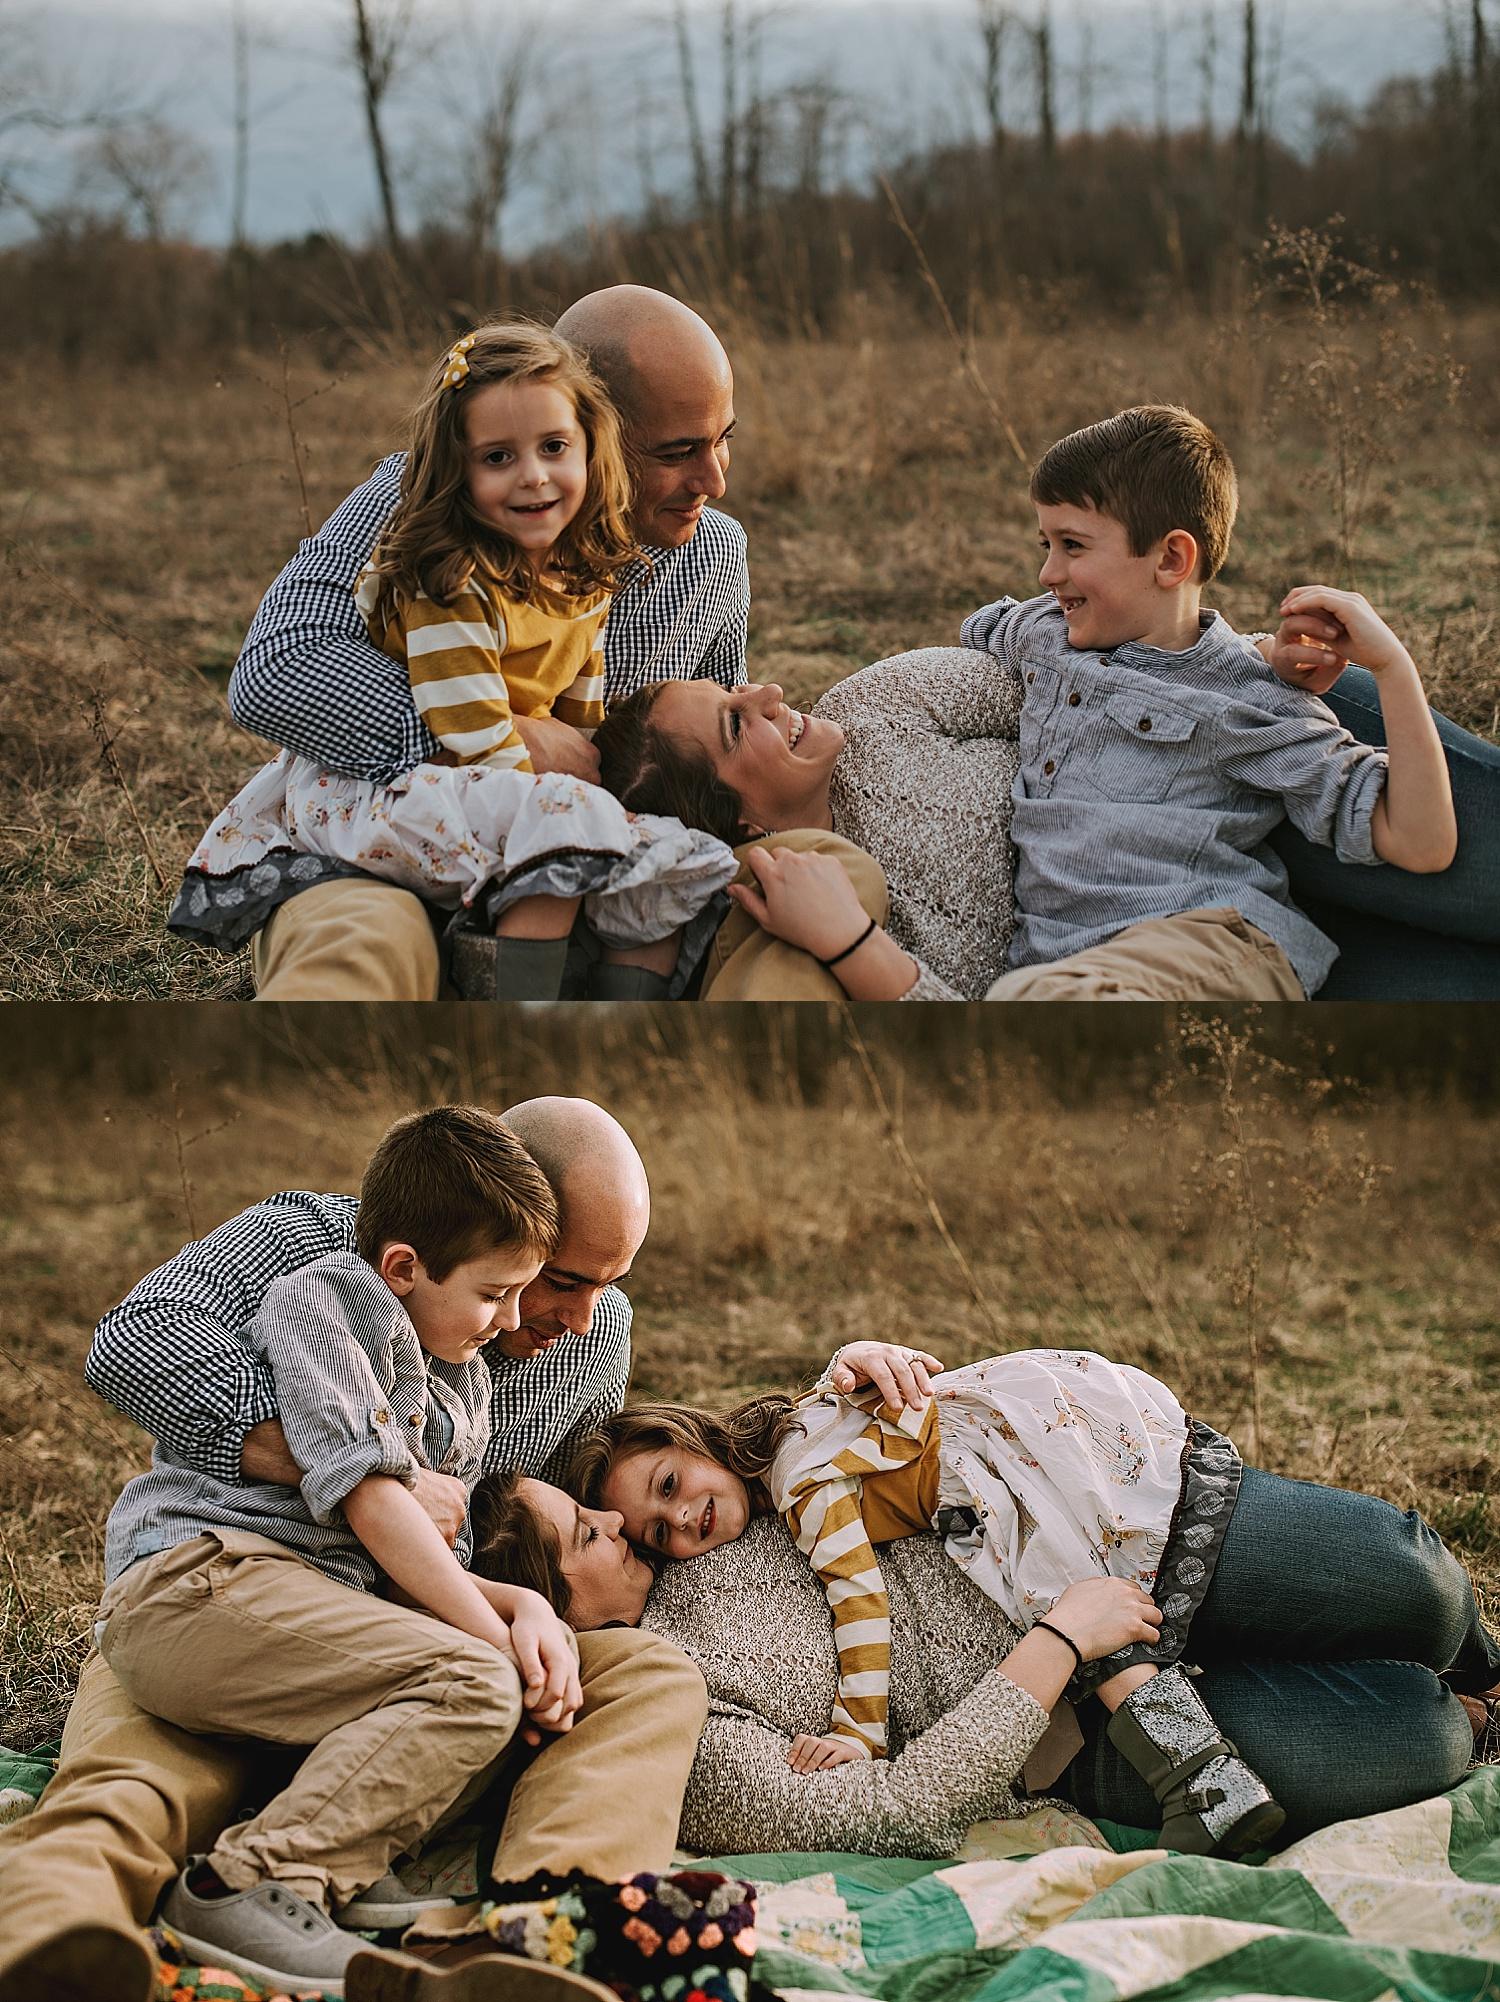 lifestyle-family-photographer-outdoors-lauren-grayson-cleveland-ohio-akron-canton-photography